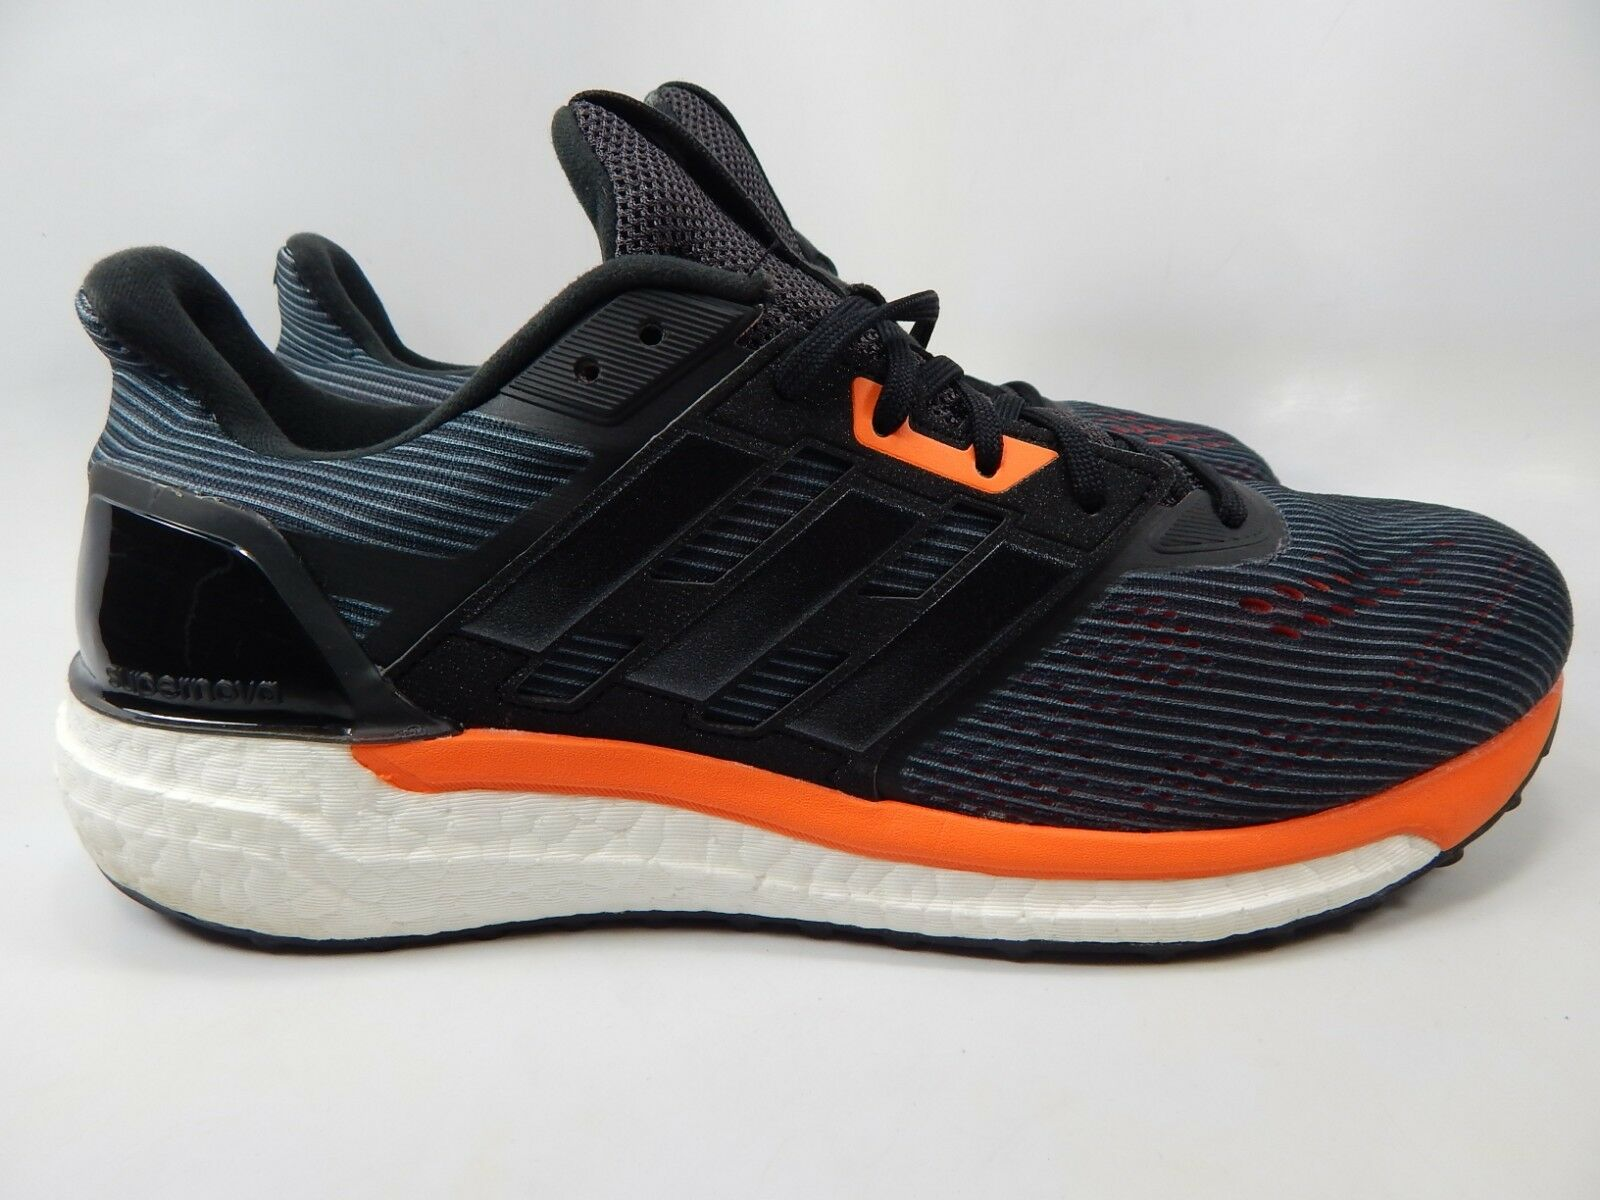 Adidas Supernova Augmentation Taille 11.5 M (D) Eu 46 Homme Chaussures Course